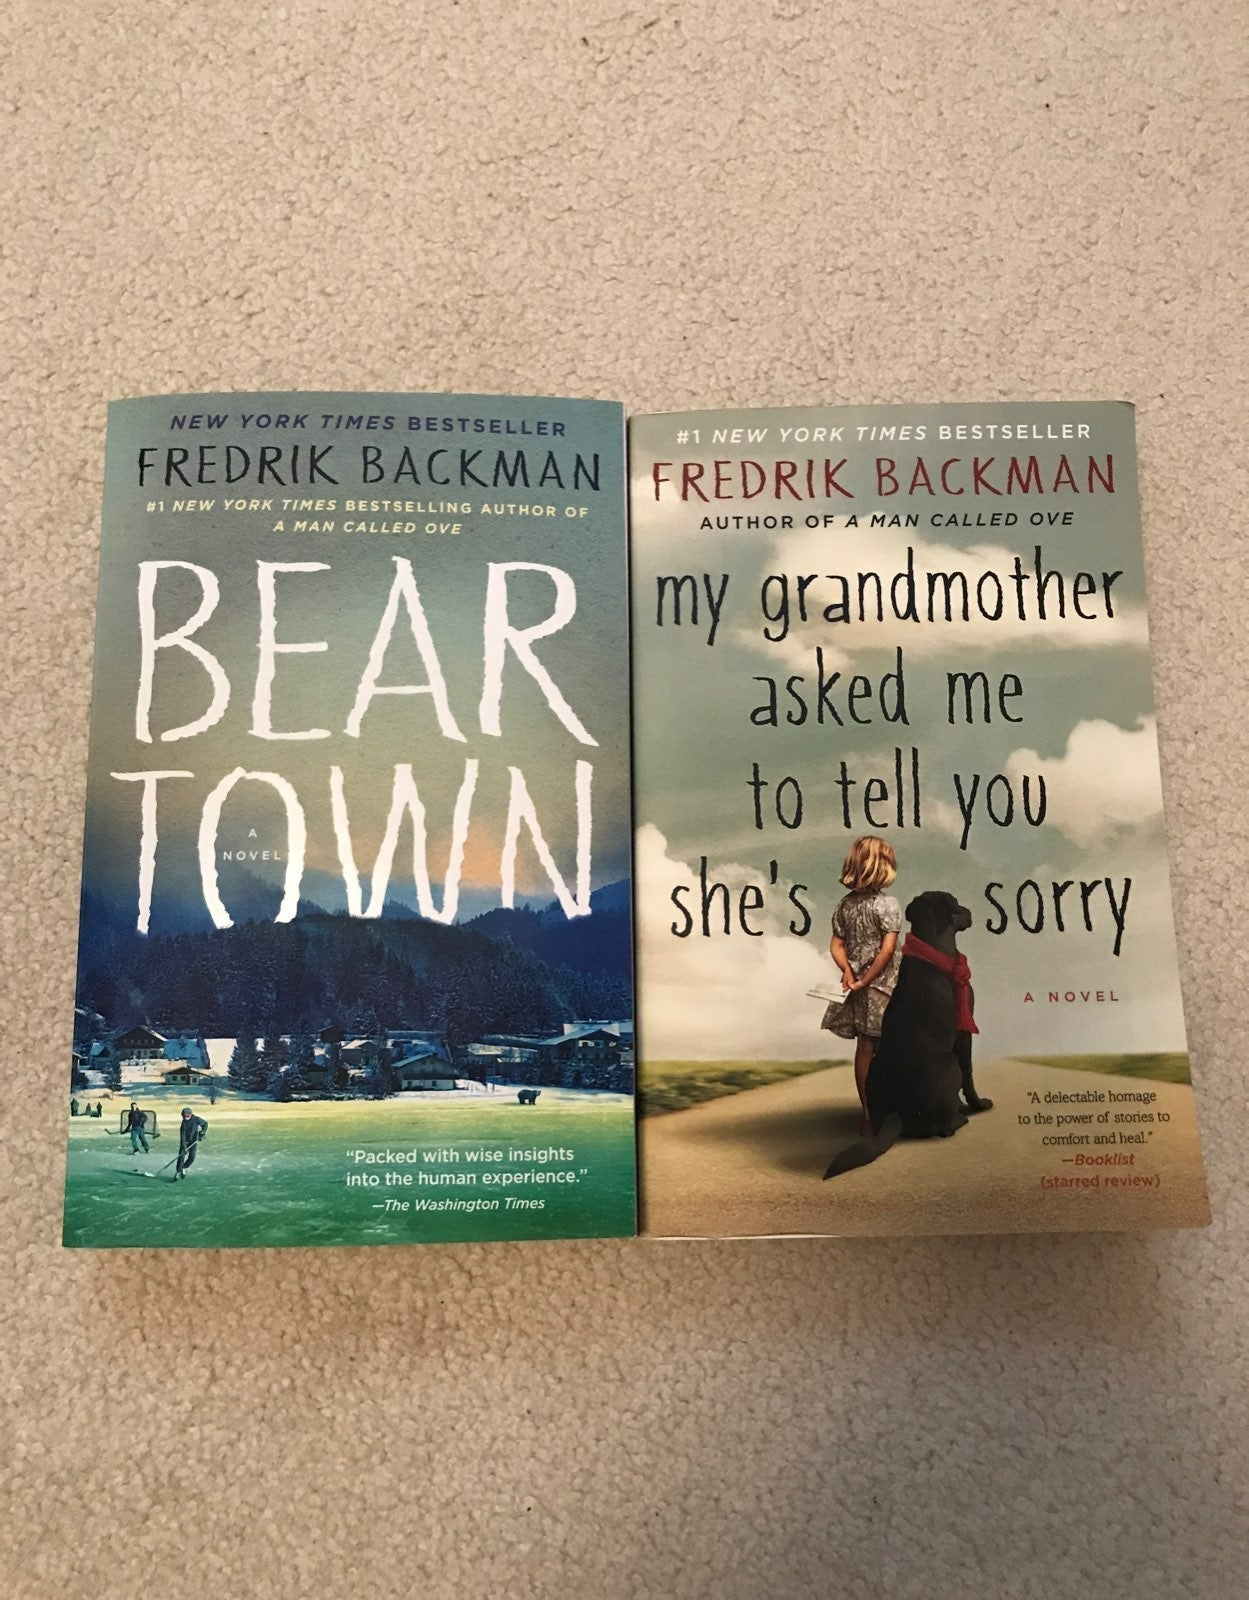 Fredrik Backman books, Beartown, my Gran